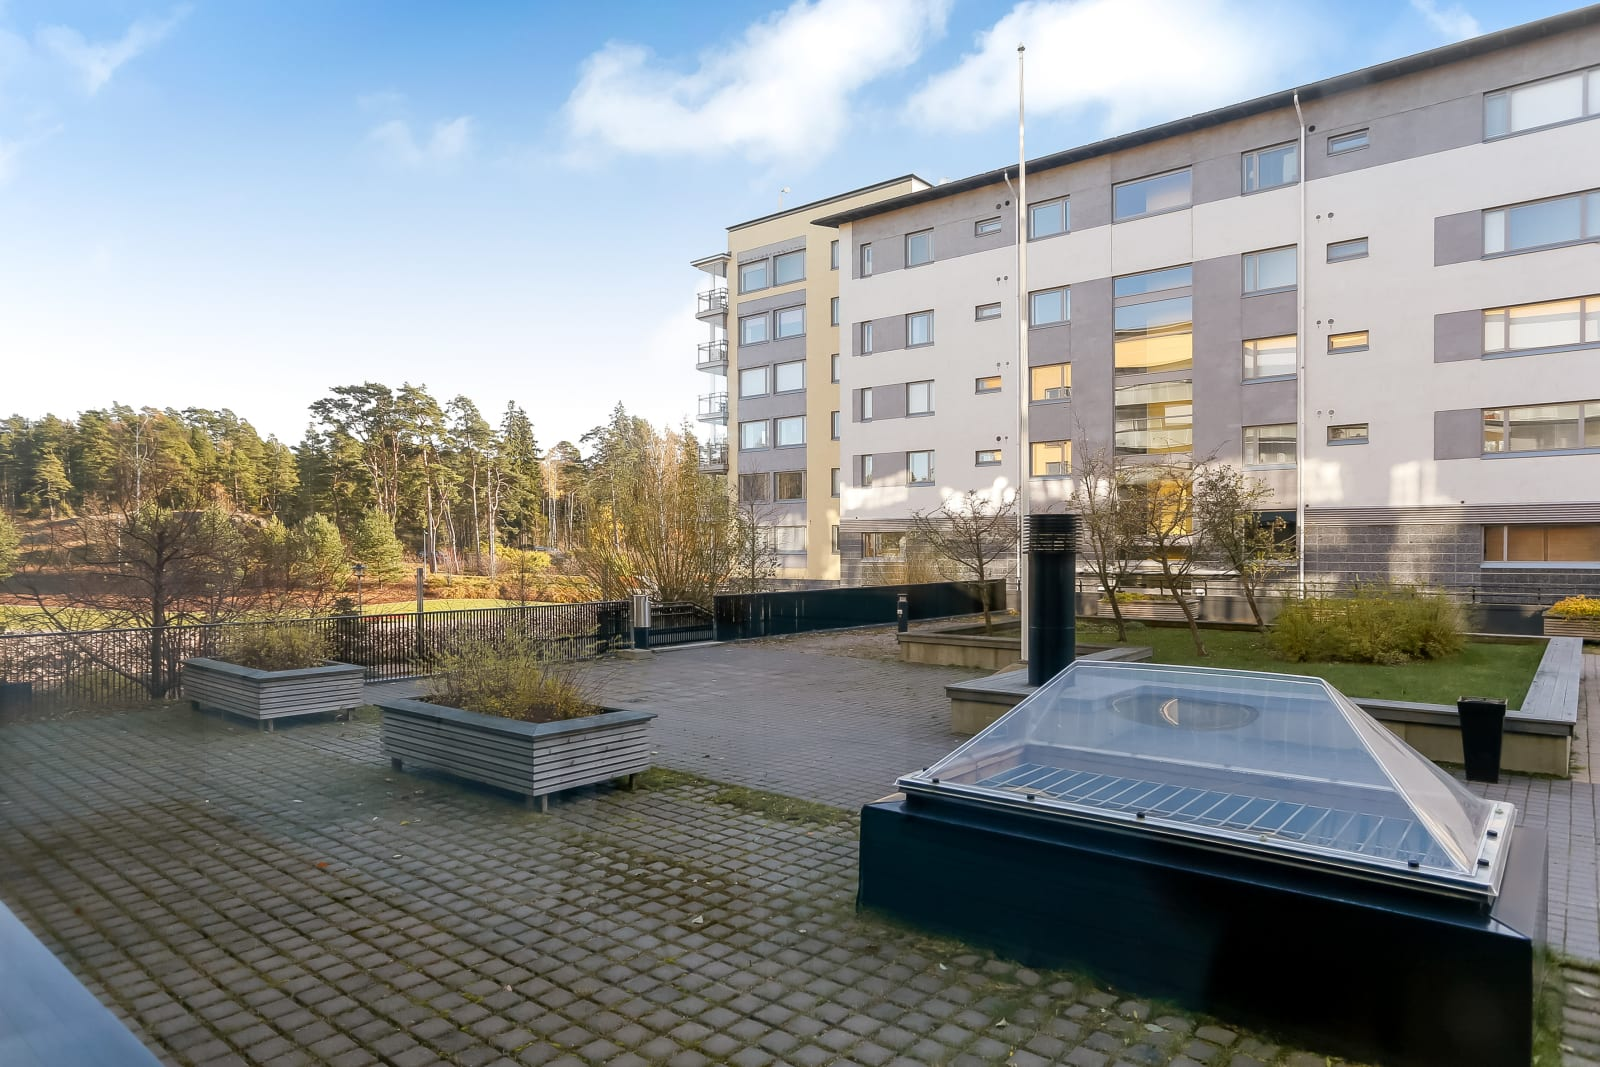 Helsinki, Aurinkolahti, Aurinkotuulenkatu 20